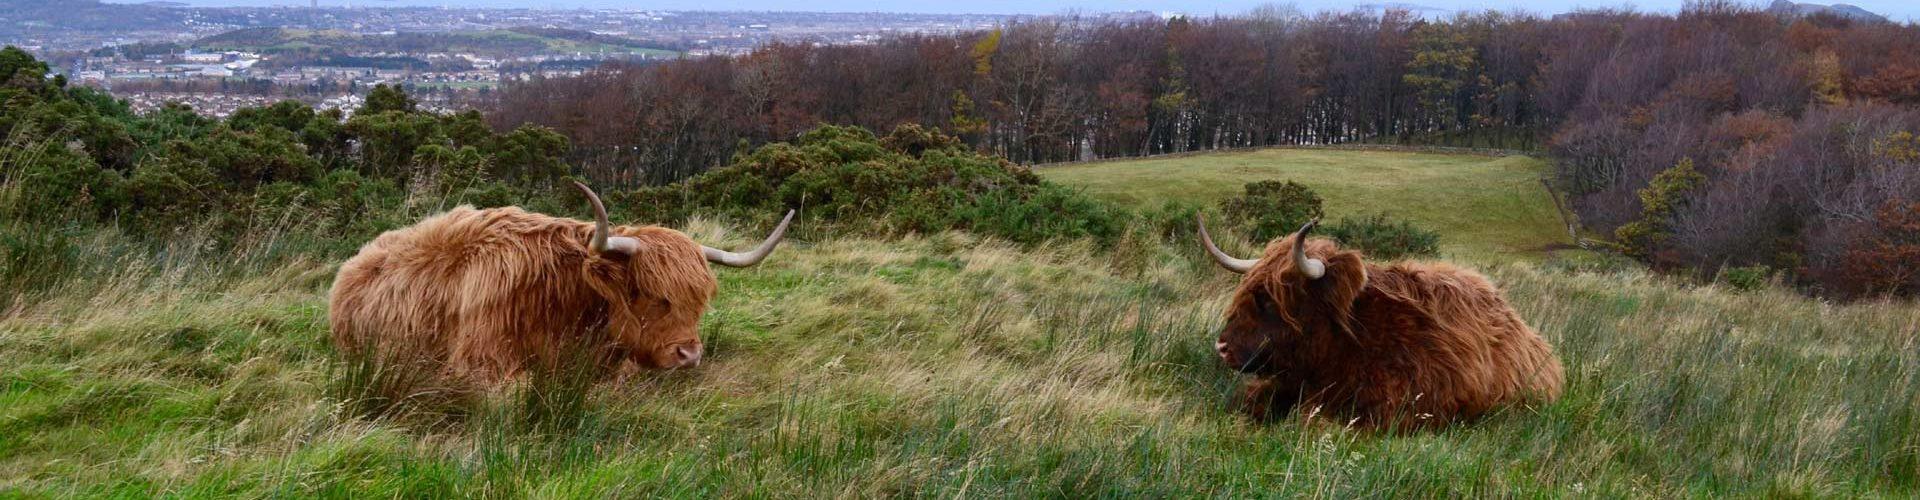 Two Highland cows on the Pentland Hills in Edinburgh